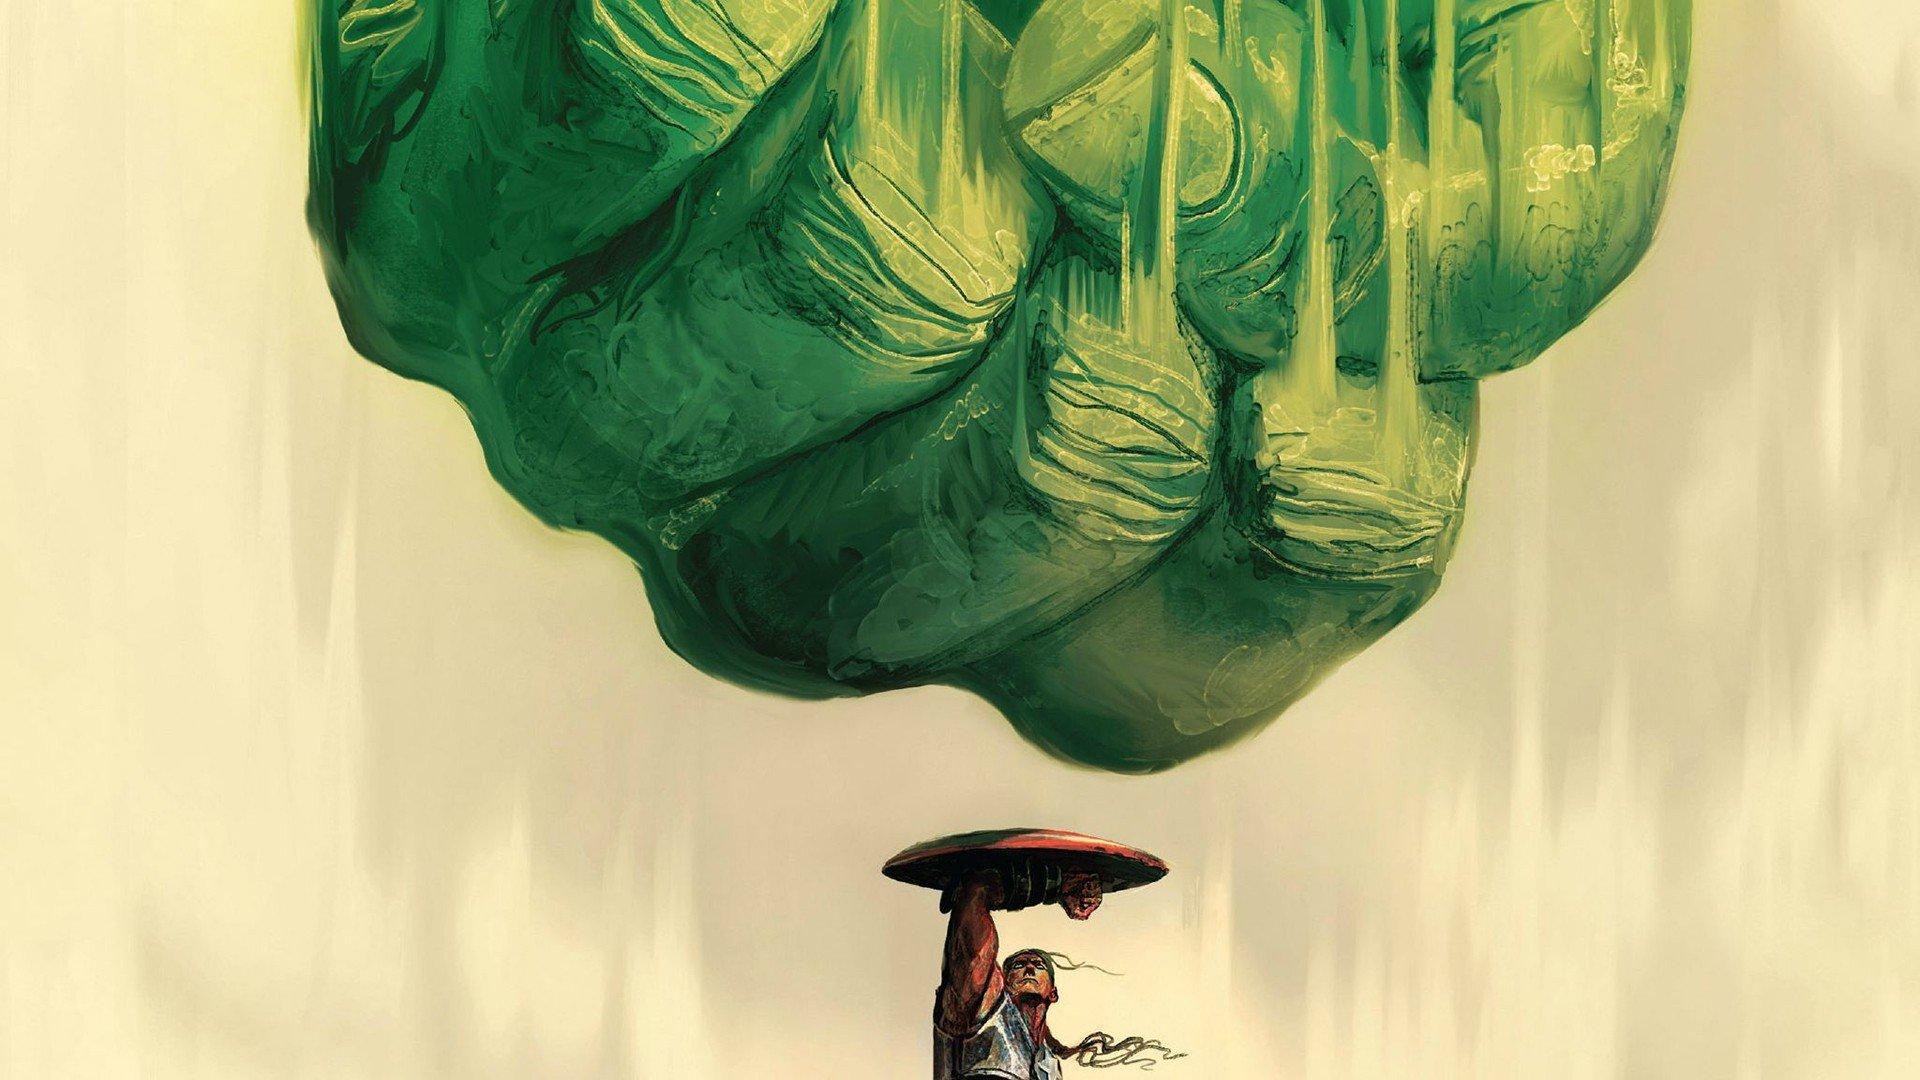 Hulk Wallpaper 4k Download